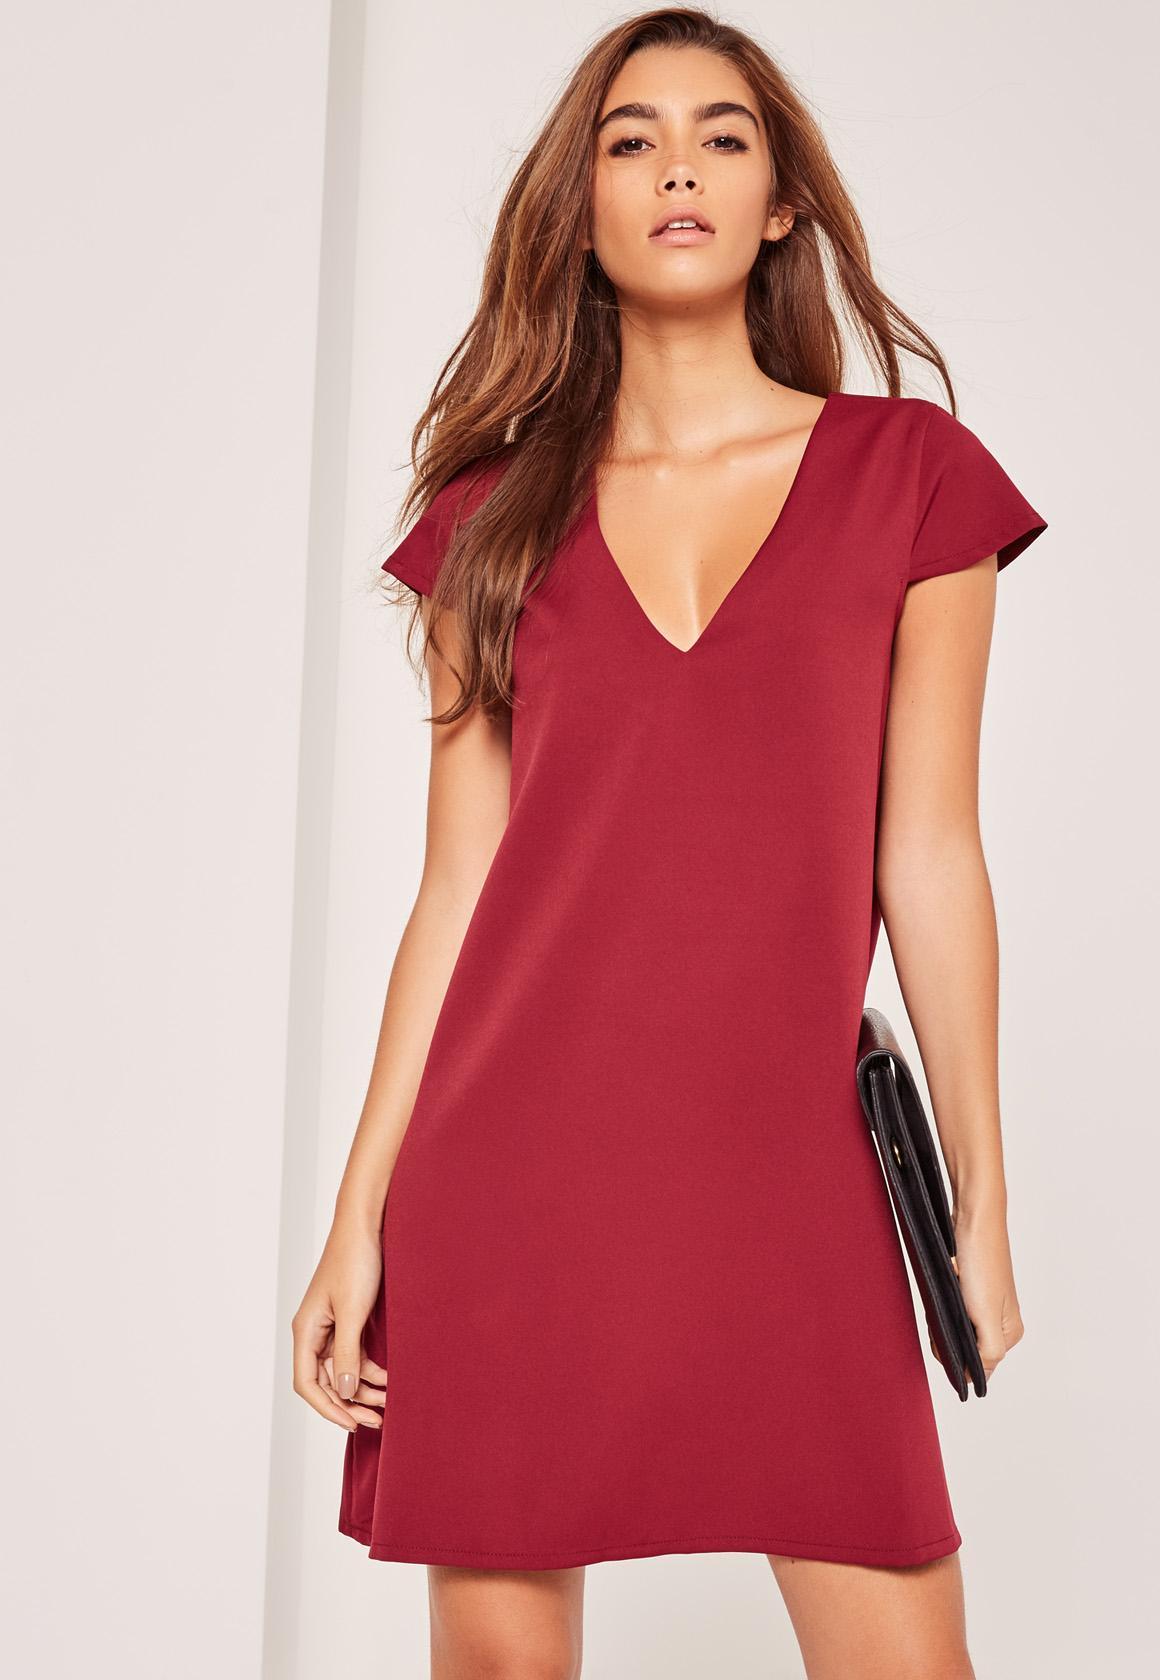 Cap Sleeve Plunge Swing Dress Red